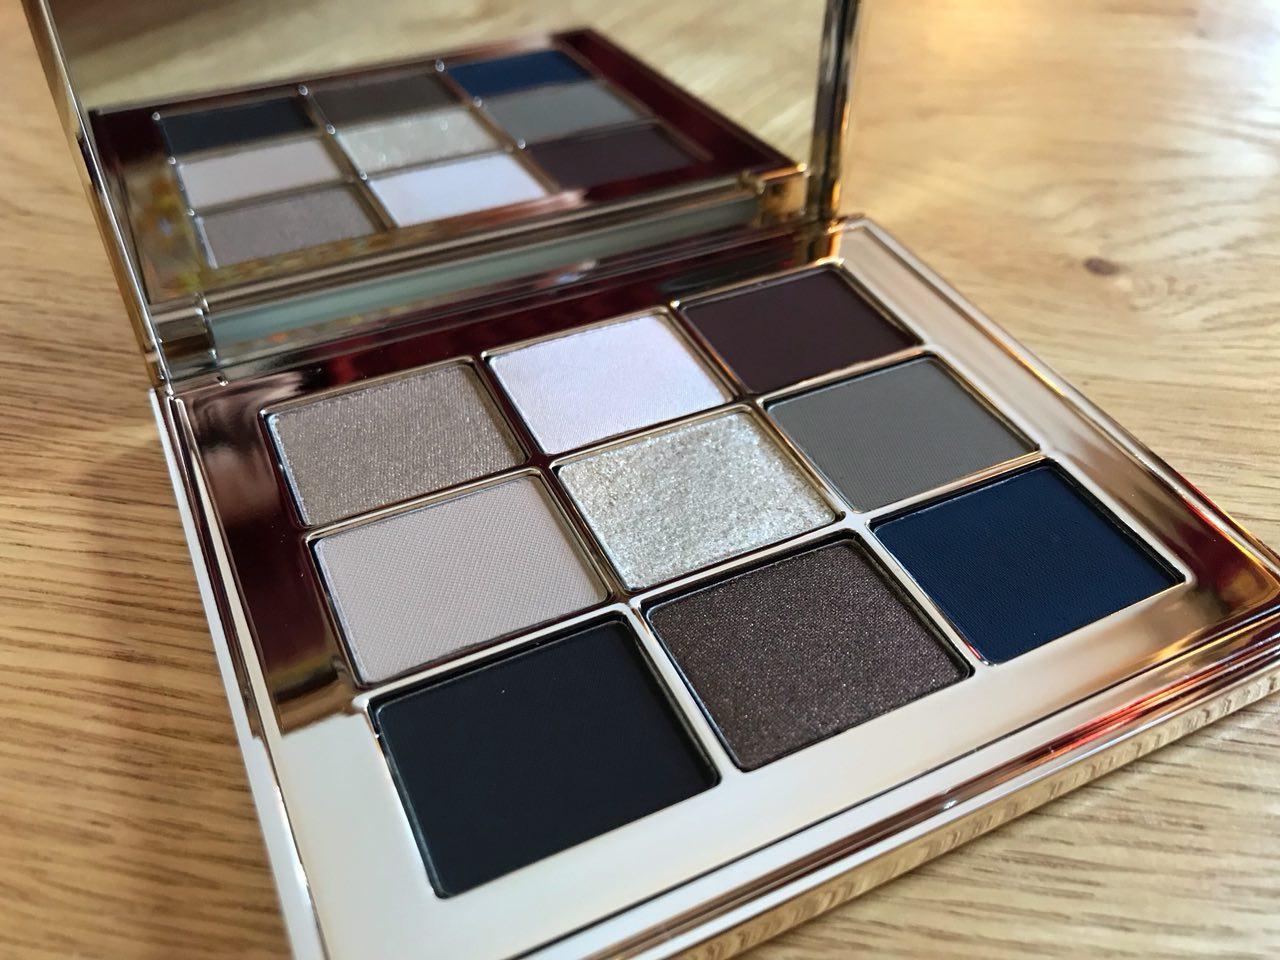 Bobbi Brown 'Caviar & Rubies' eyeshadow palette